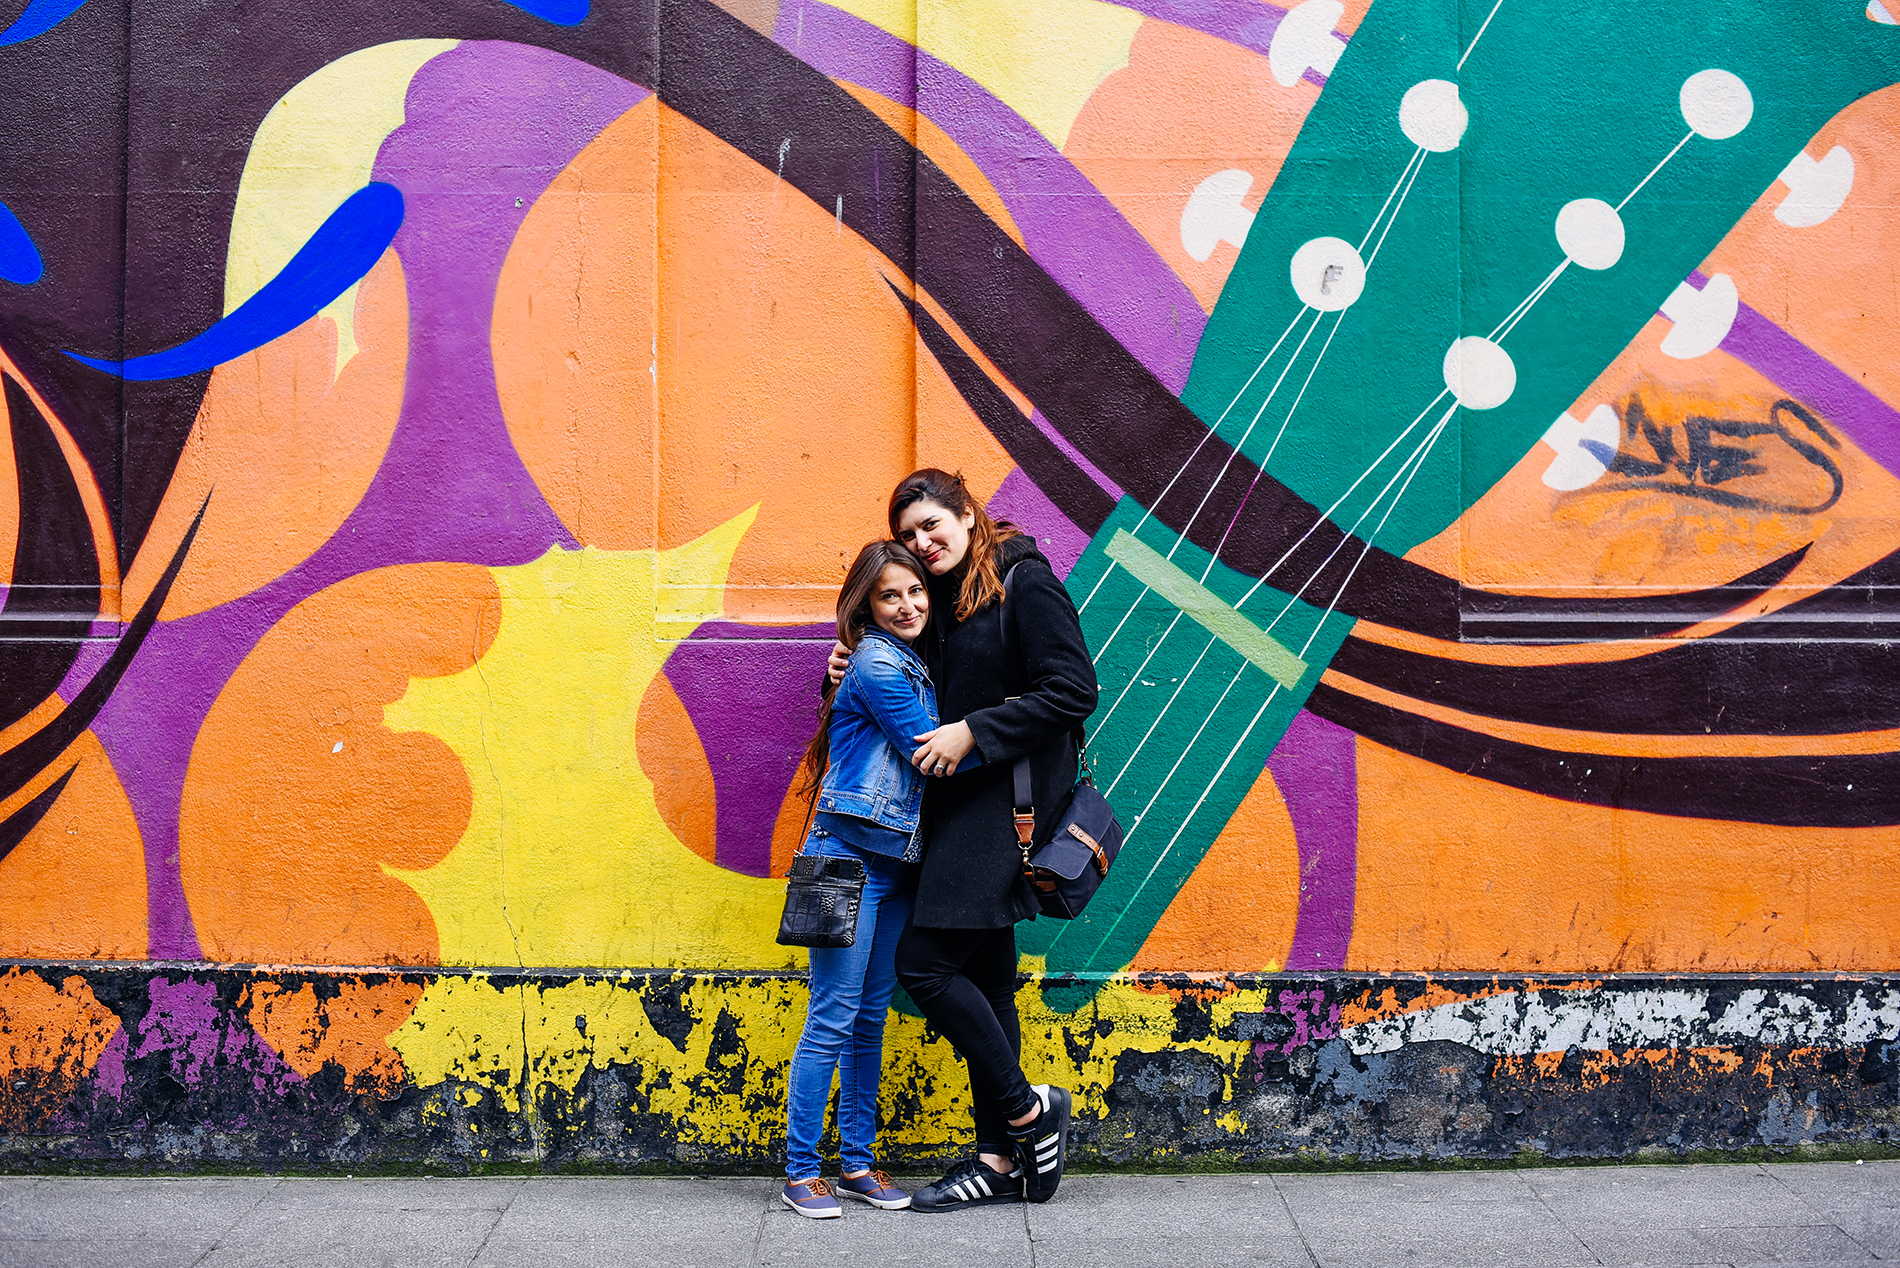 Paula Abrahão | BLOG - Projeto 6 on 6 - Taís em Dublin